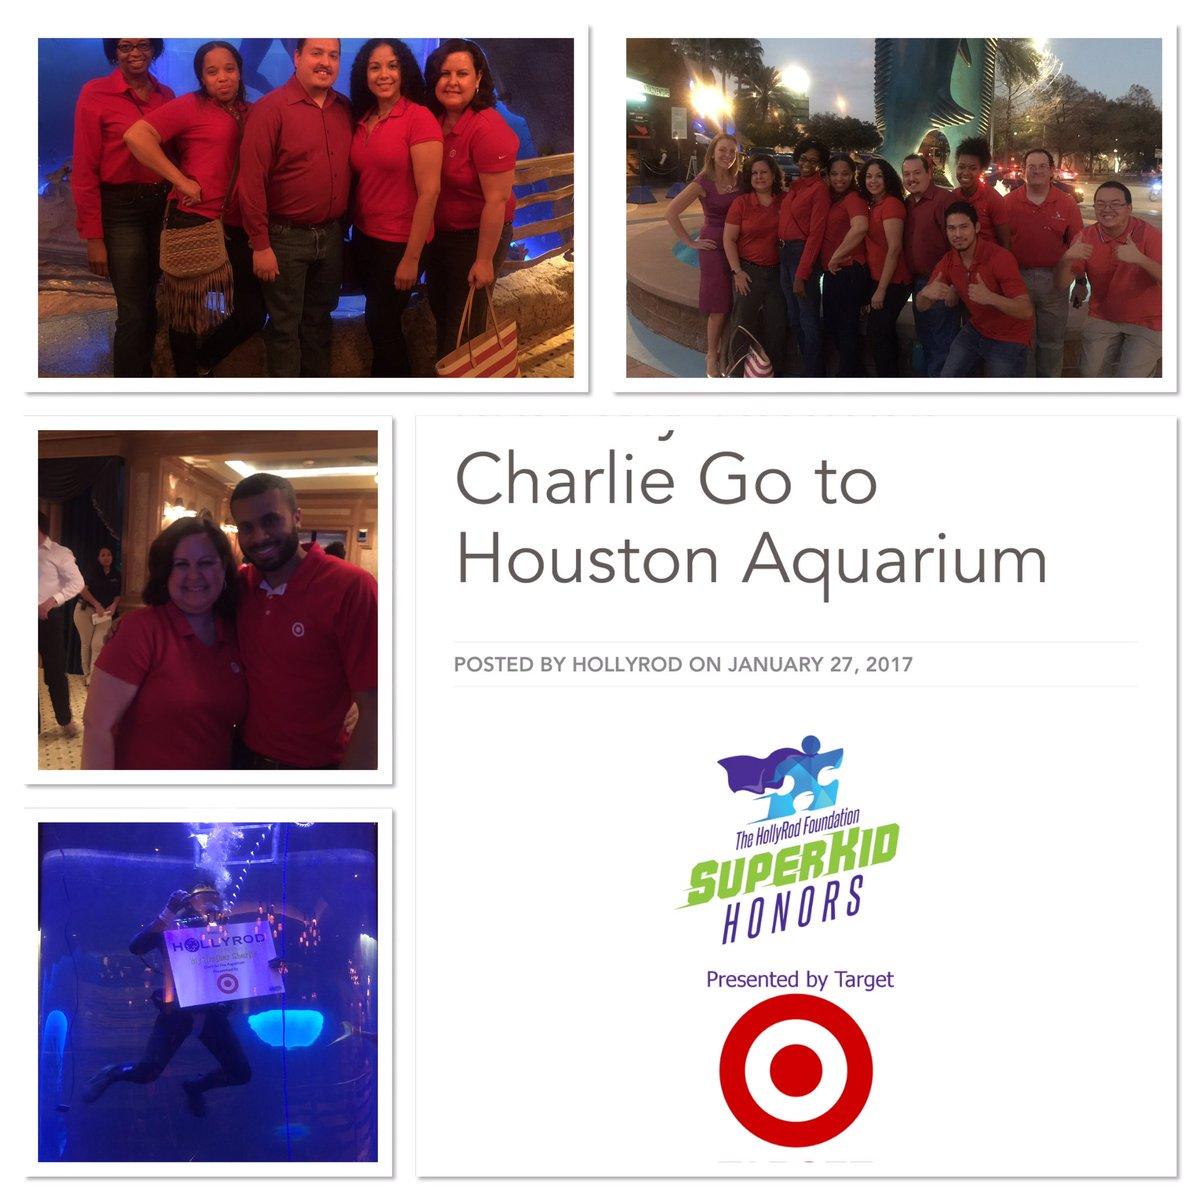 Holly Rod foundation #D311 #g392 @LayshaWard @ChanceNeese @melissaplaster<br>http://pic.twitter.com/CMgwNh9mVx &ndash; bij Downtown Aquarium